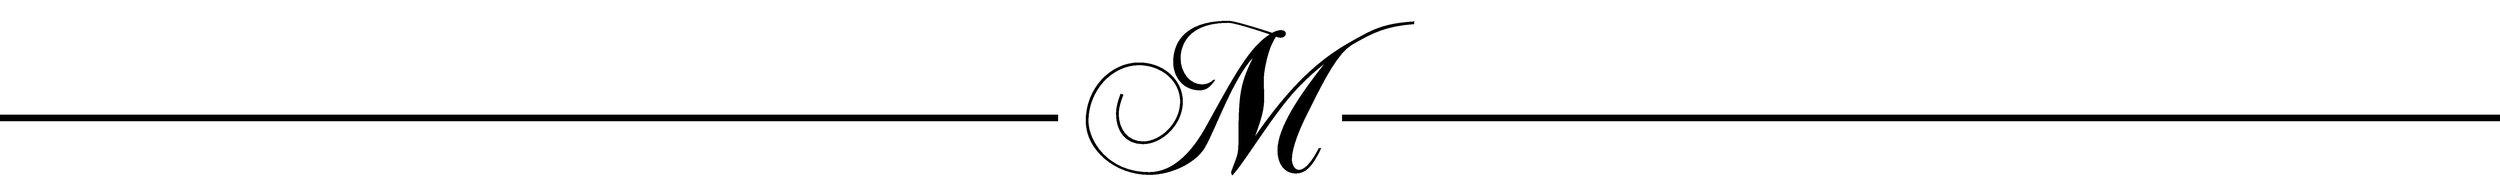 - M --page-001.jpg